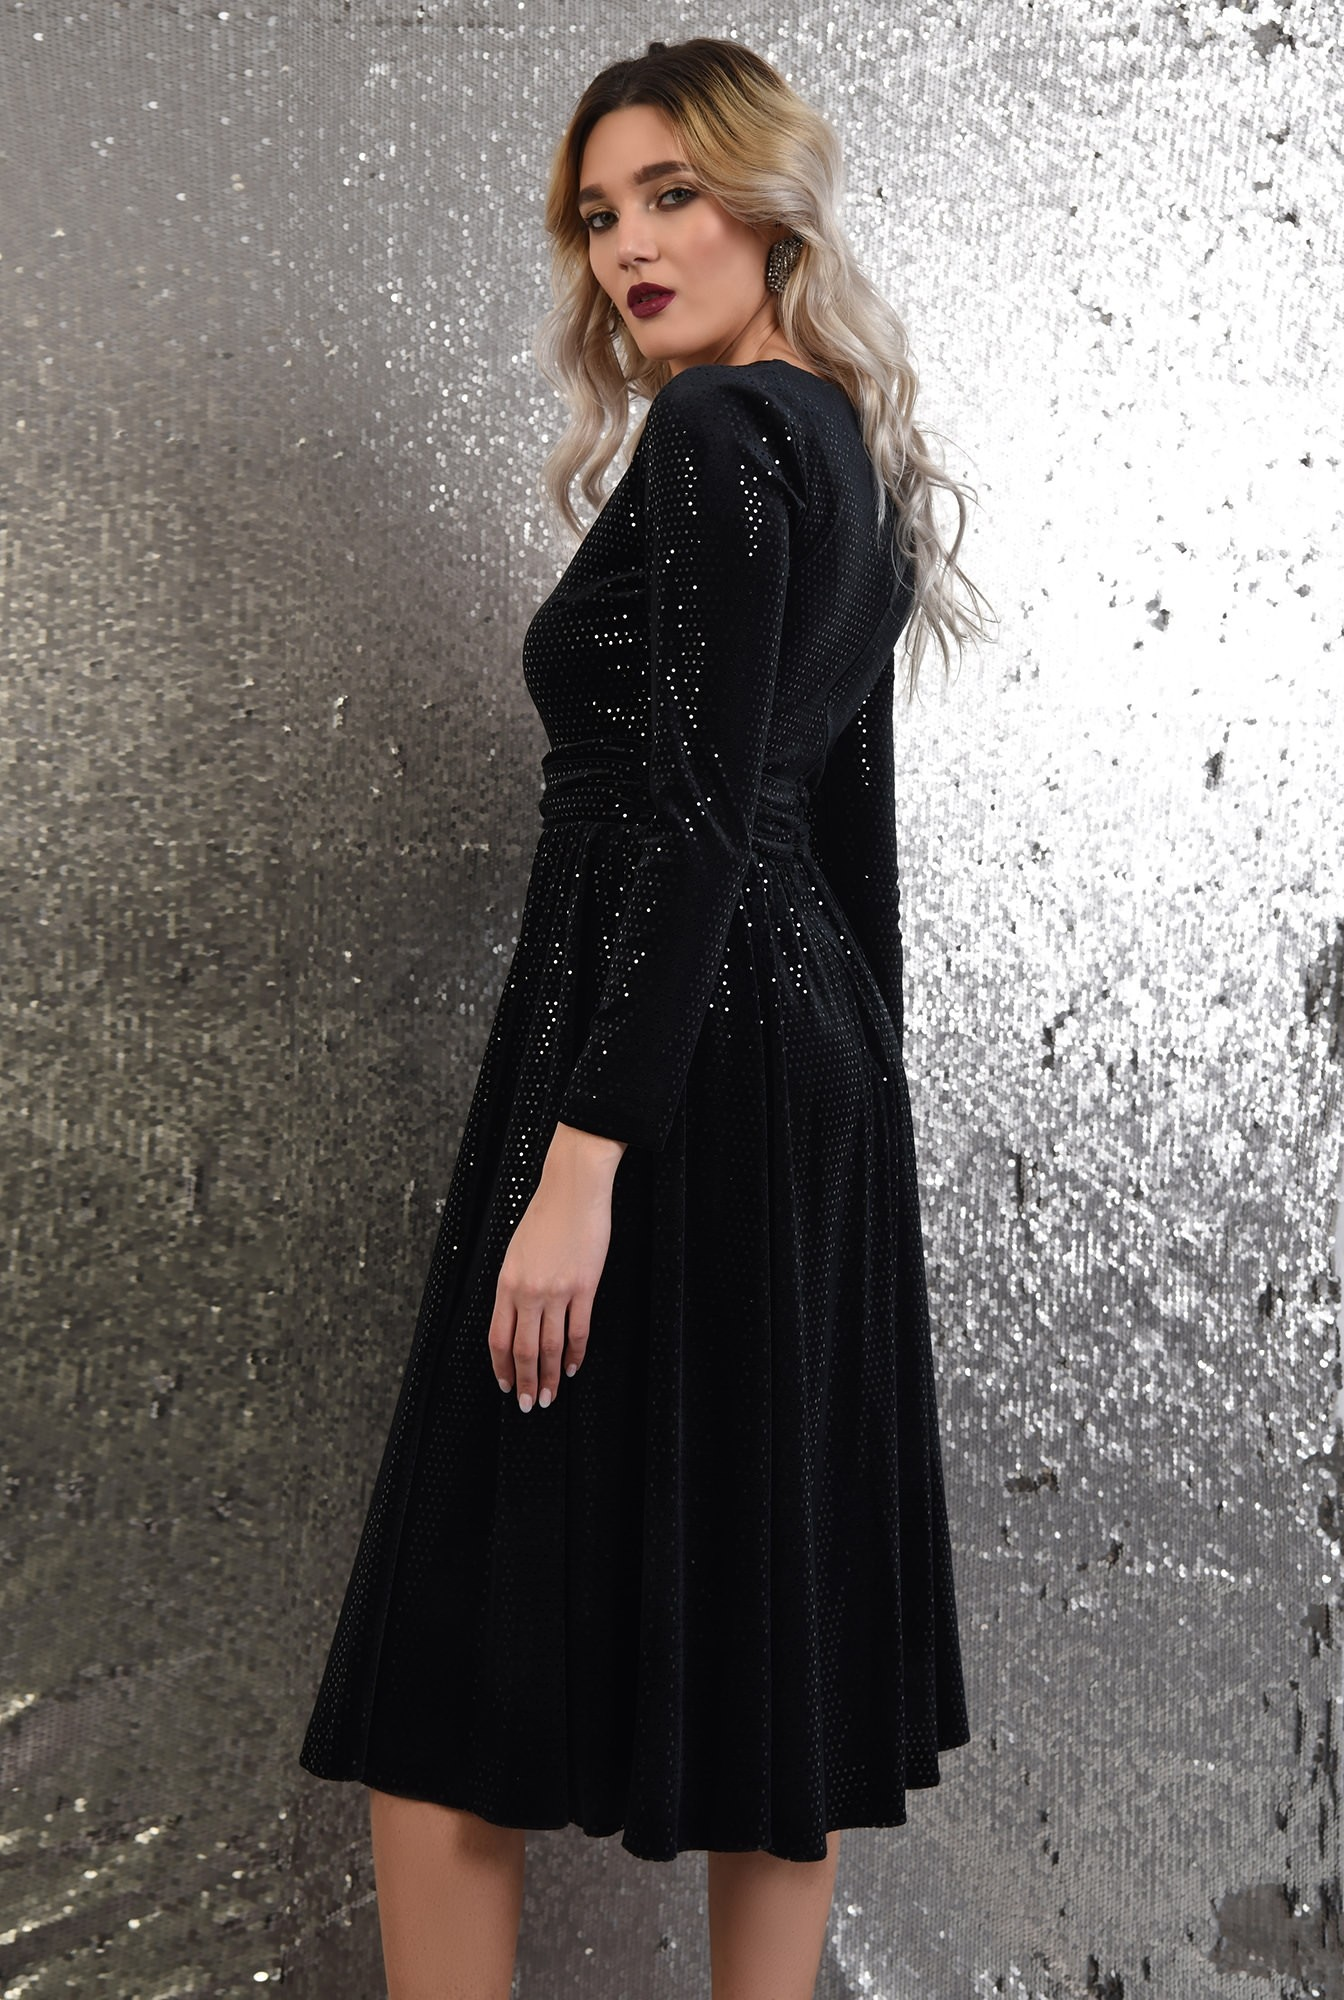 1 - 360 - rochie de ocazie, neagra, midi, evazata, anchior, paiete buline